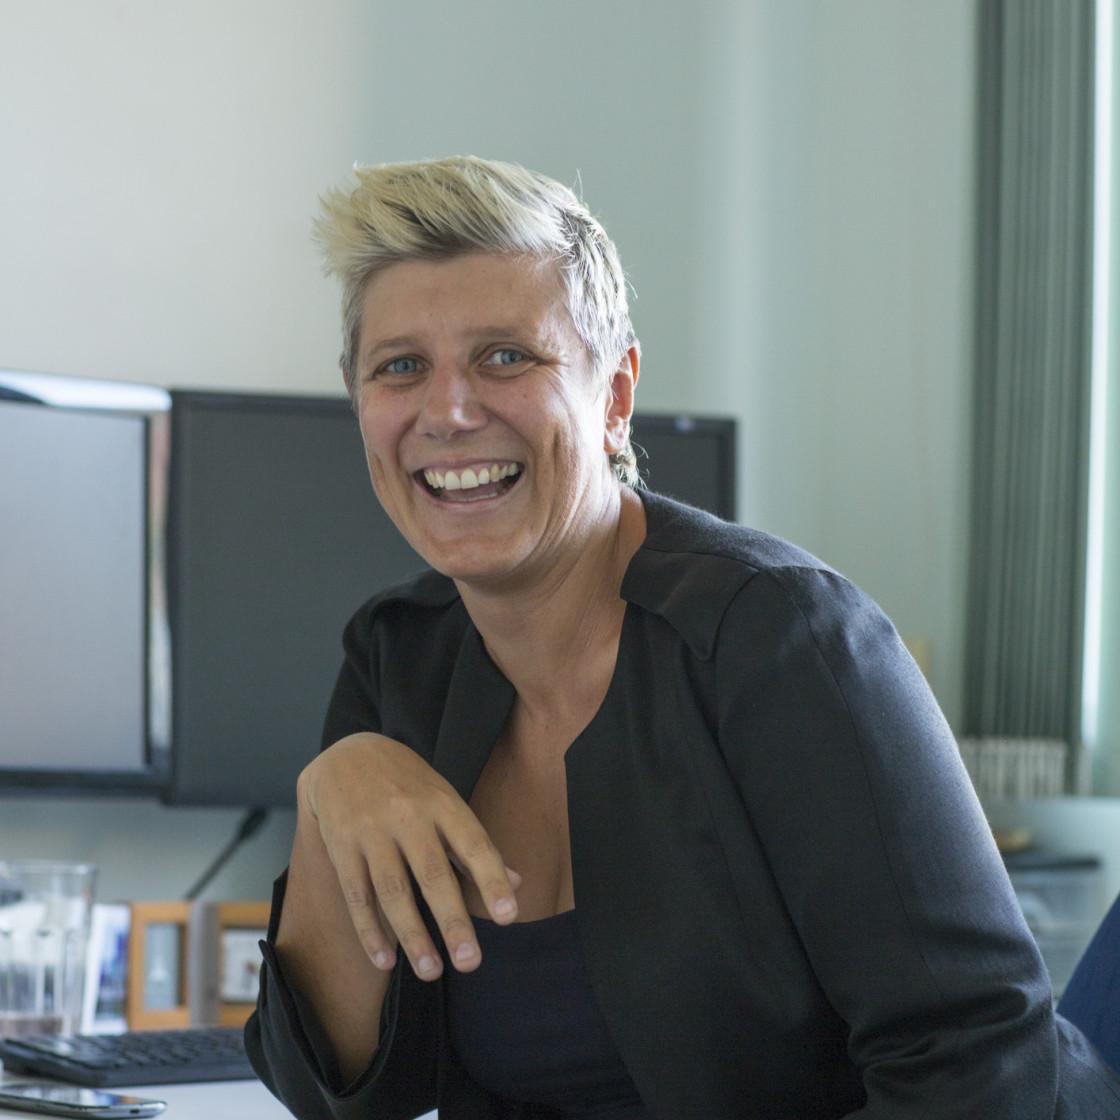 Melanie Thorley at work - Brisbane employment lawyer for both employee and employers